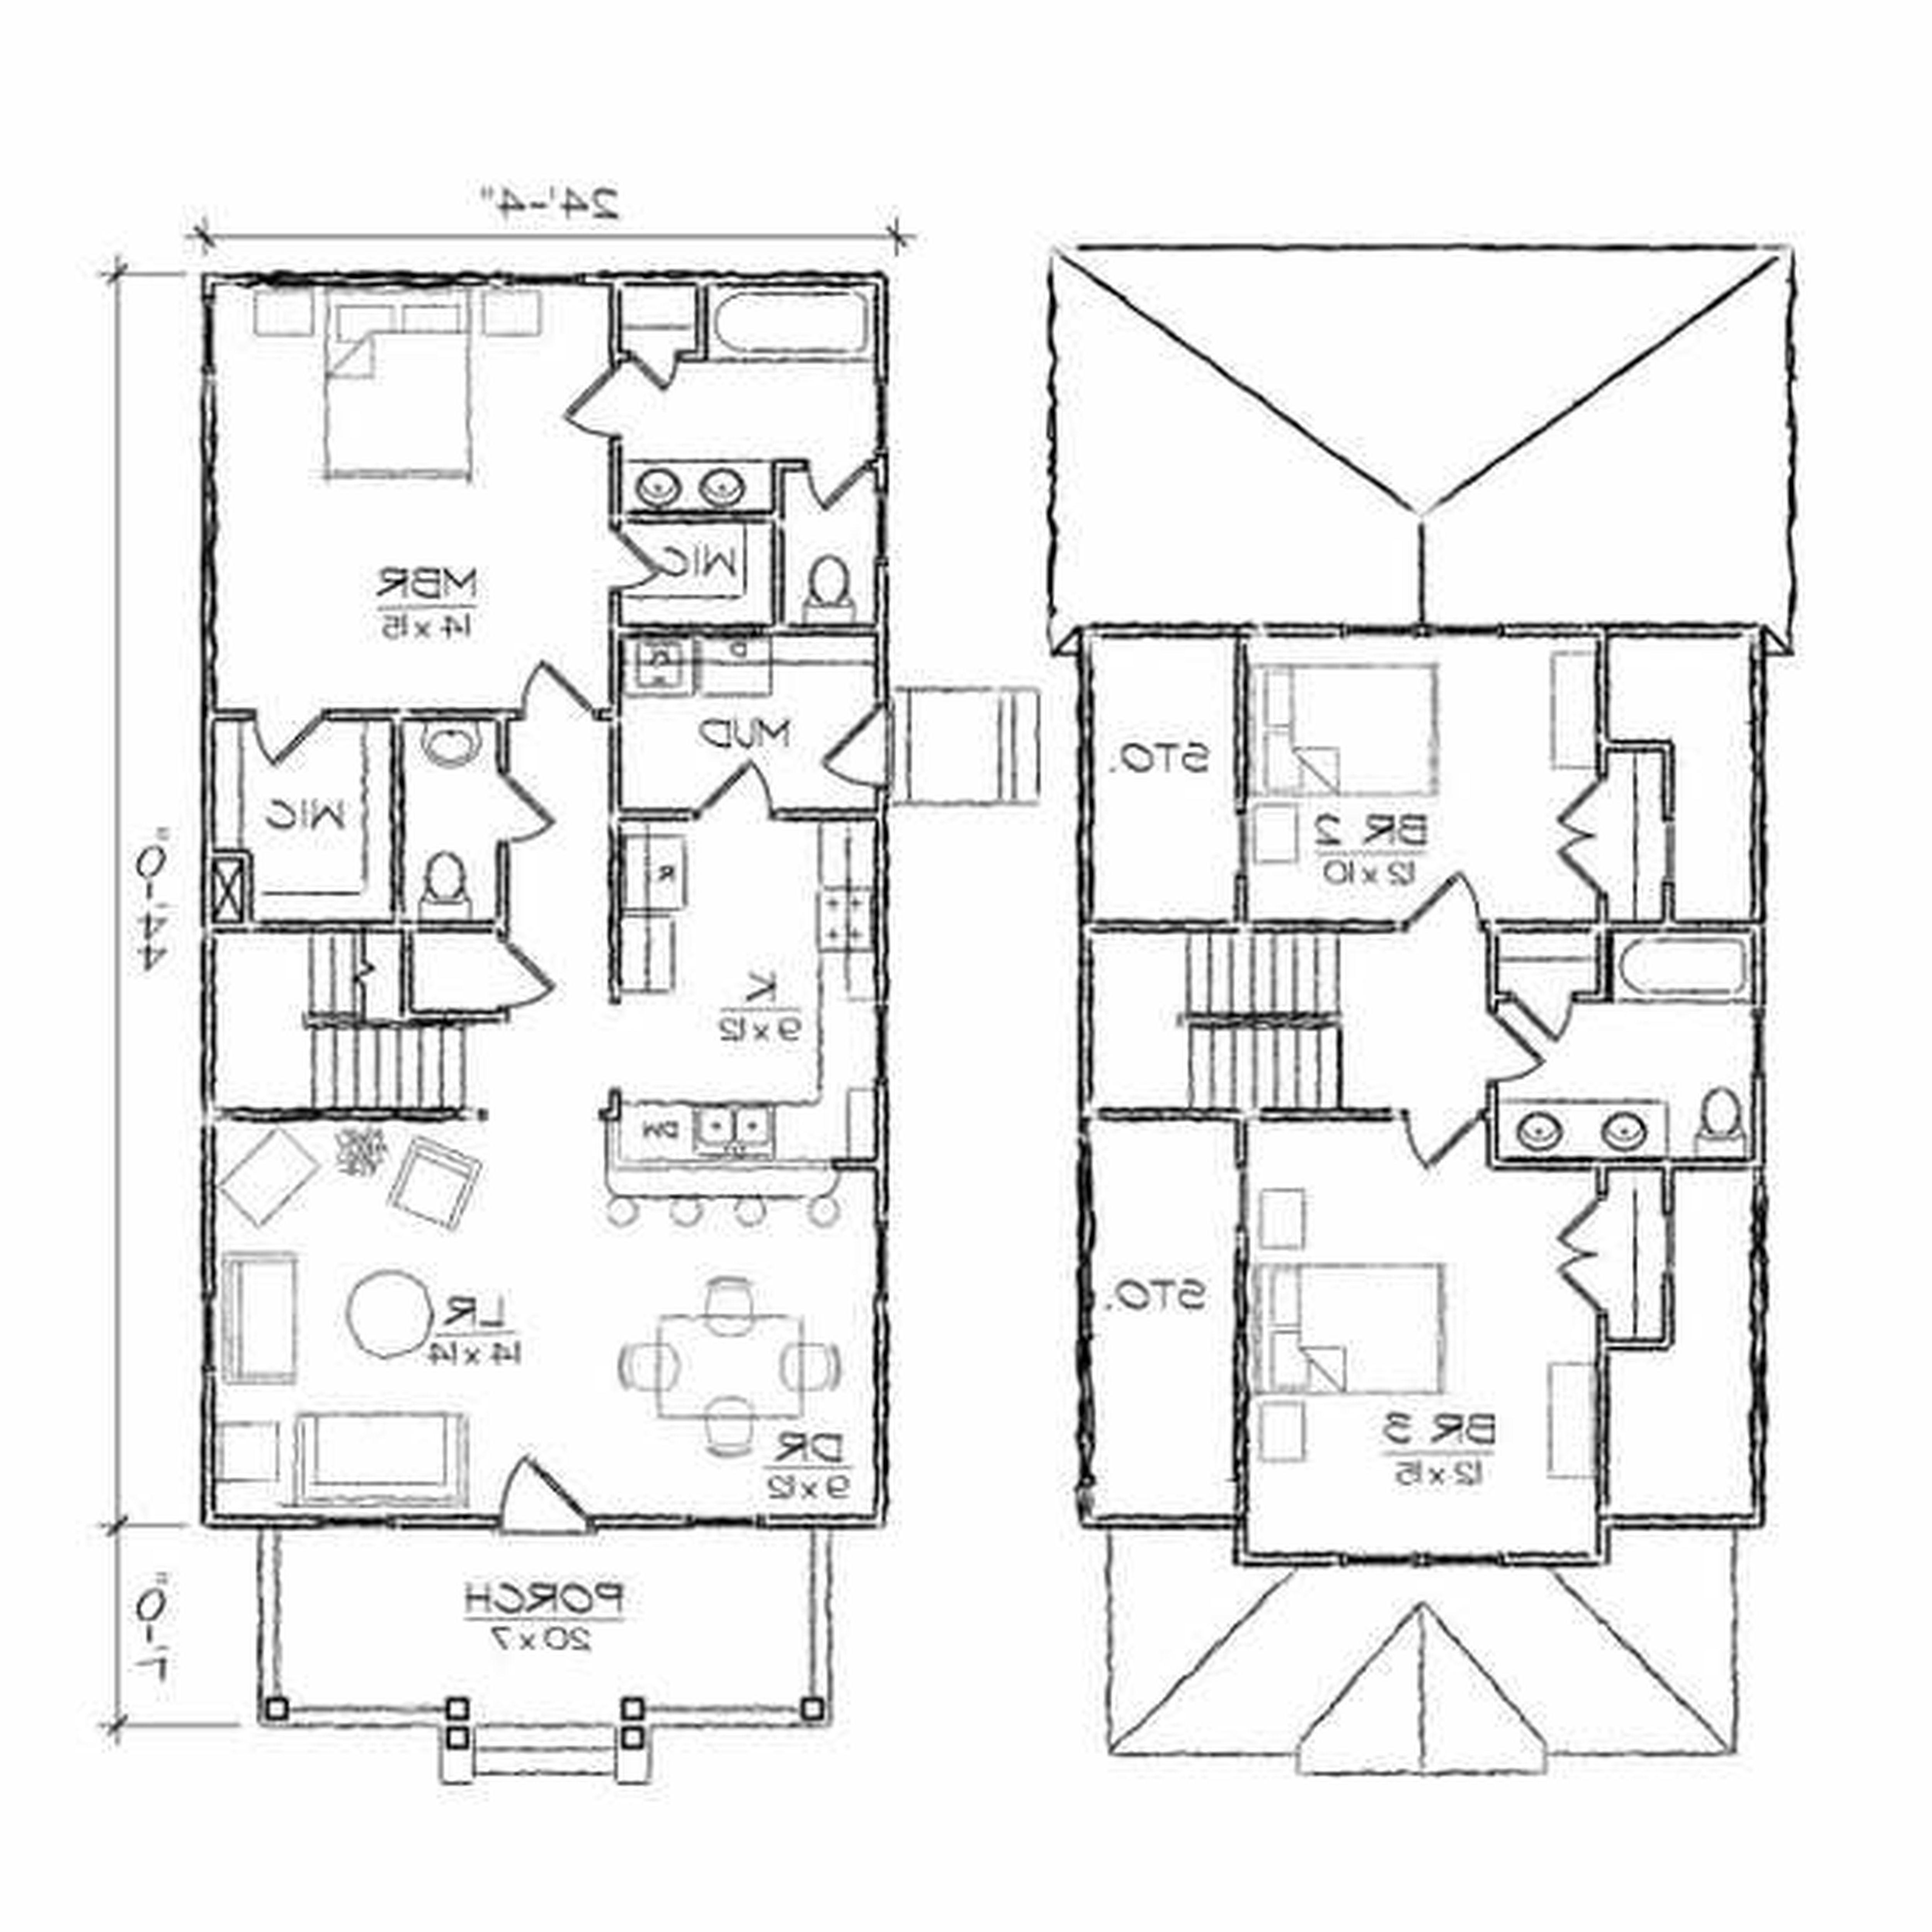 5000x5000 Building Plan Design Online